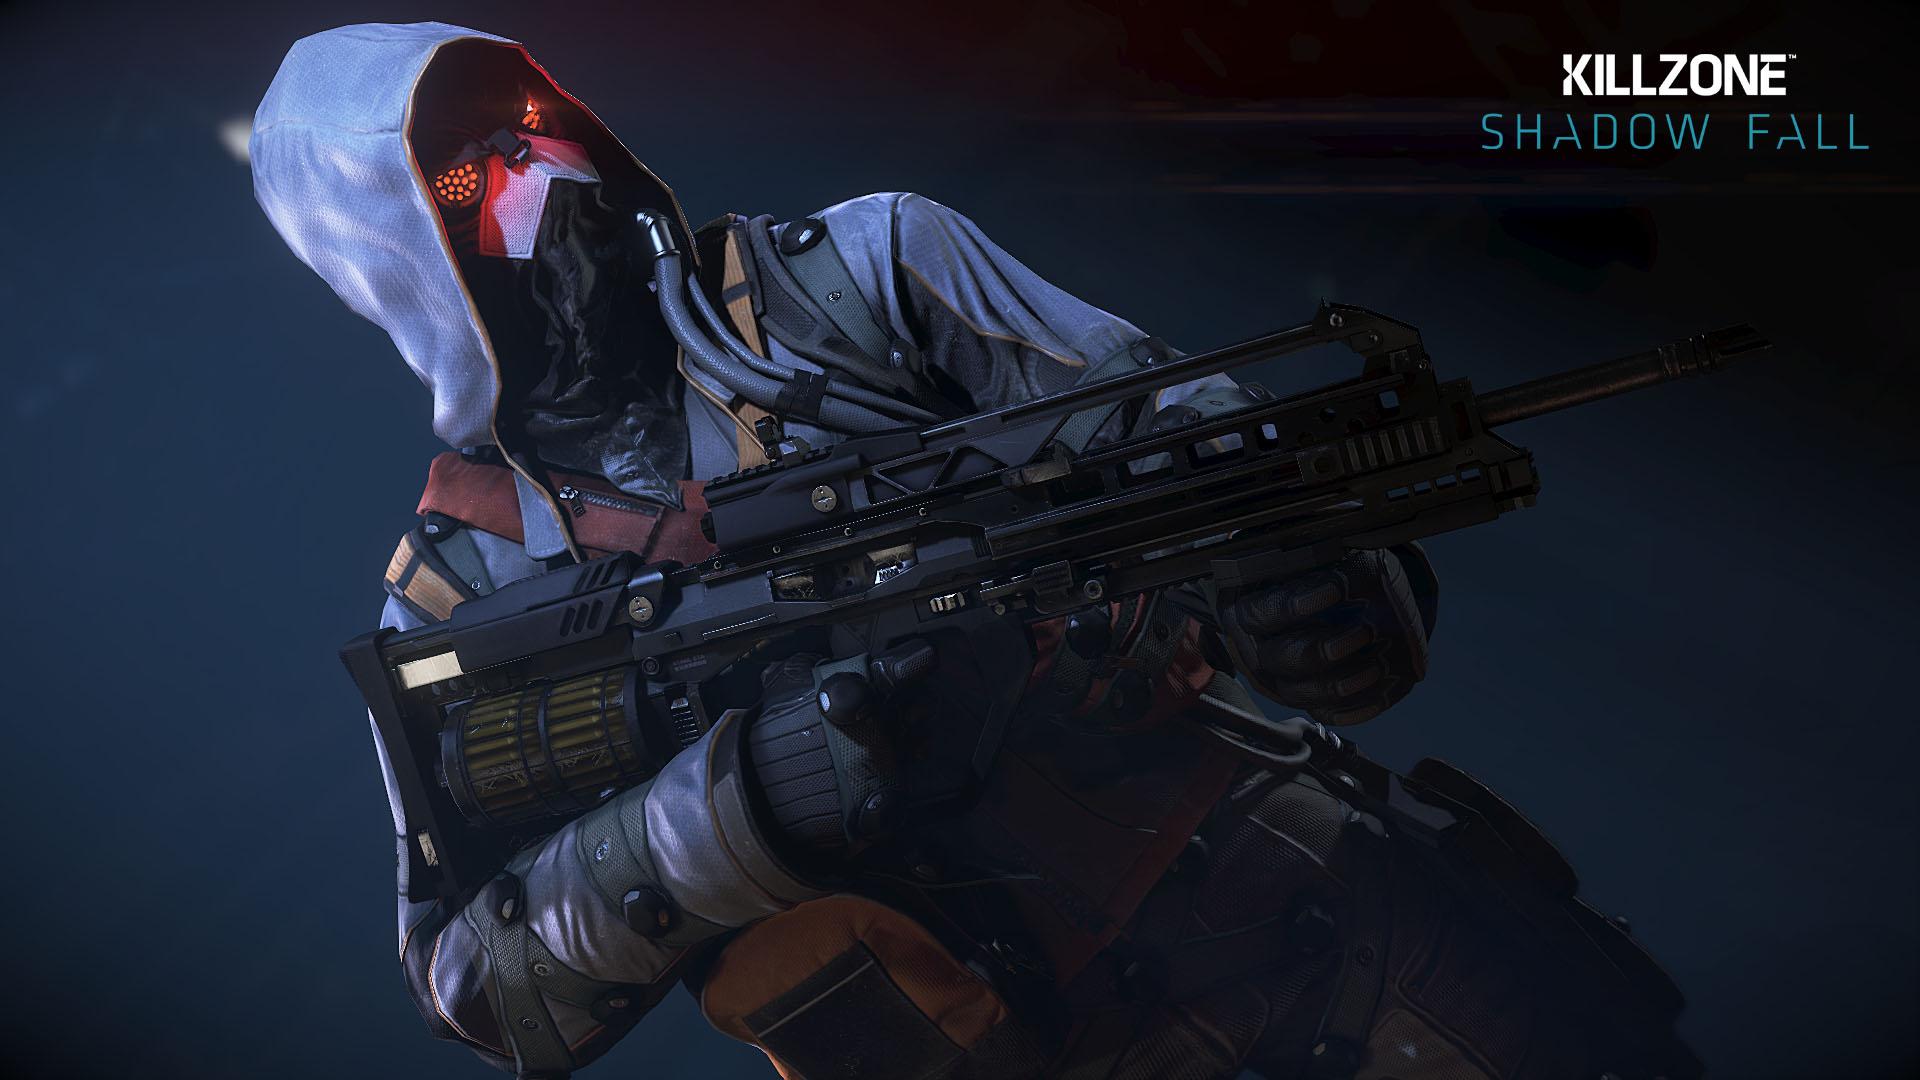 [Oficial] Killzone:Shadow Fall 9837120704_6de2448f5c_o